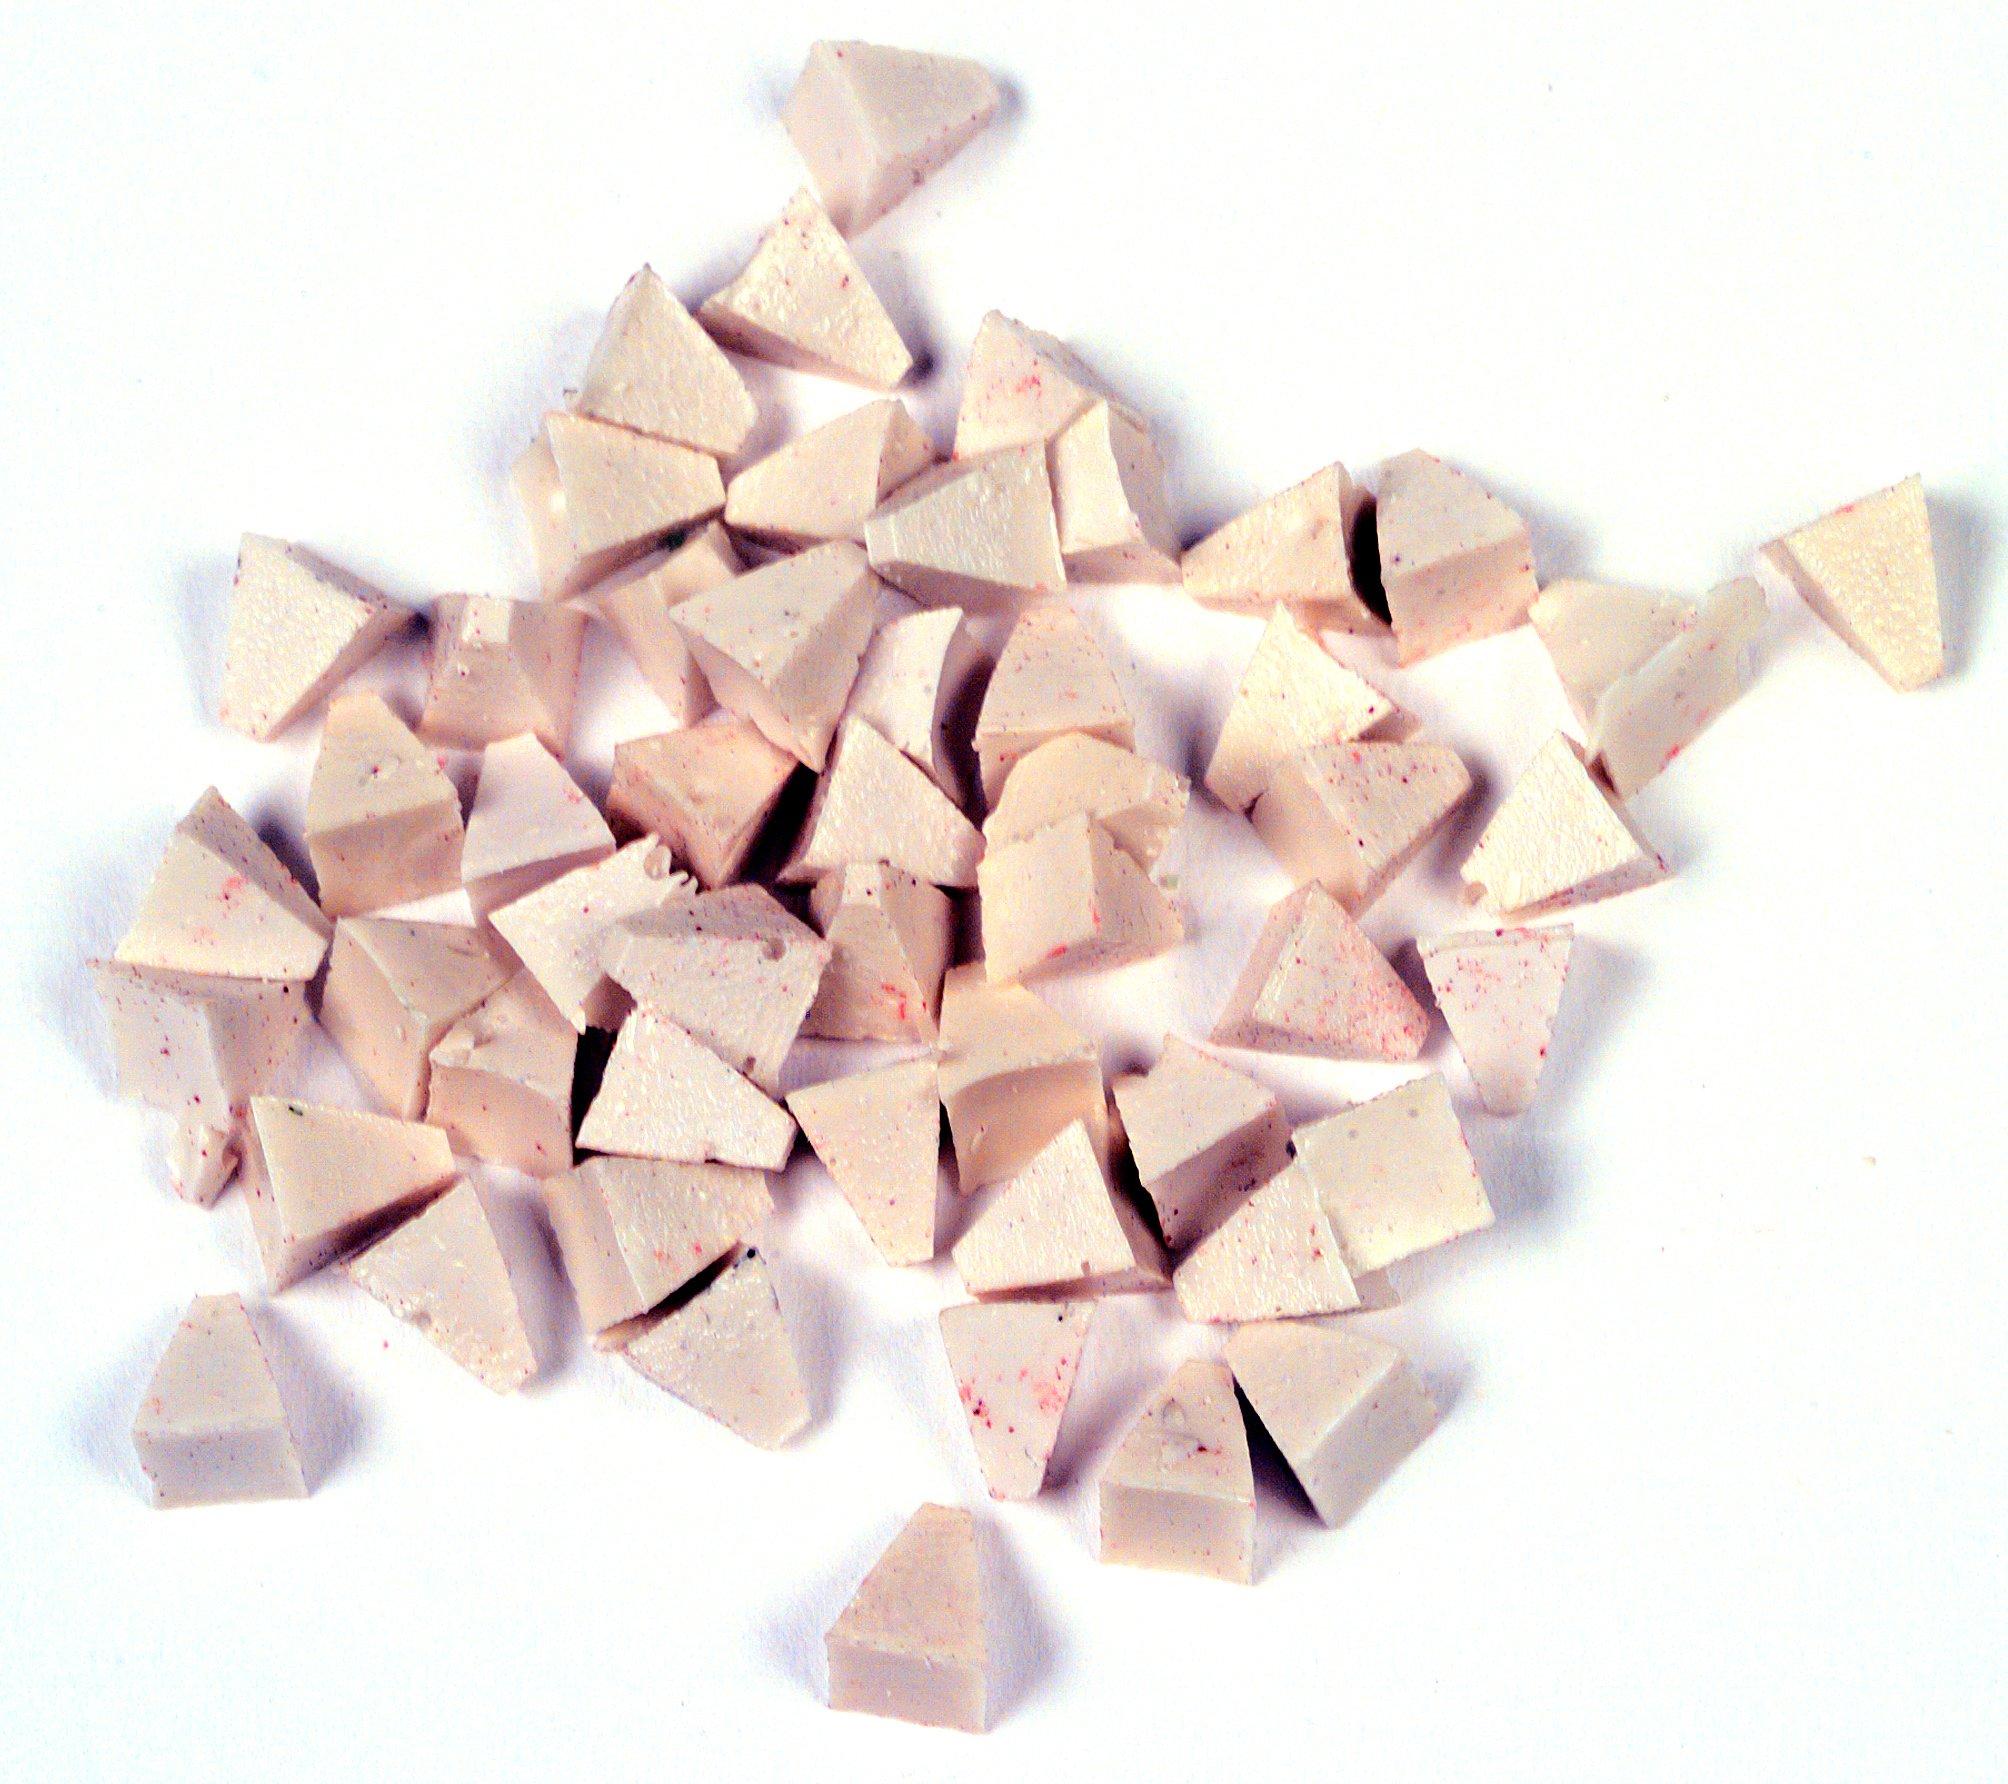 Raytech 41-131 Light Cut Pyramids Plastic Media, 55 lbs/cu ft Density, 1/4'' Size, White, 5lbs Weight